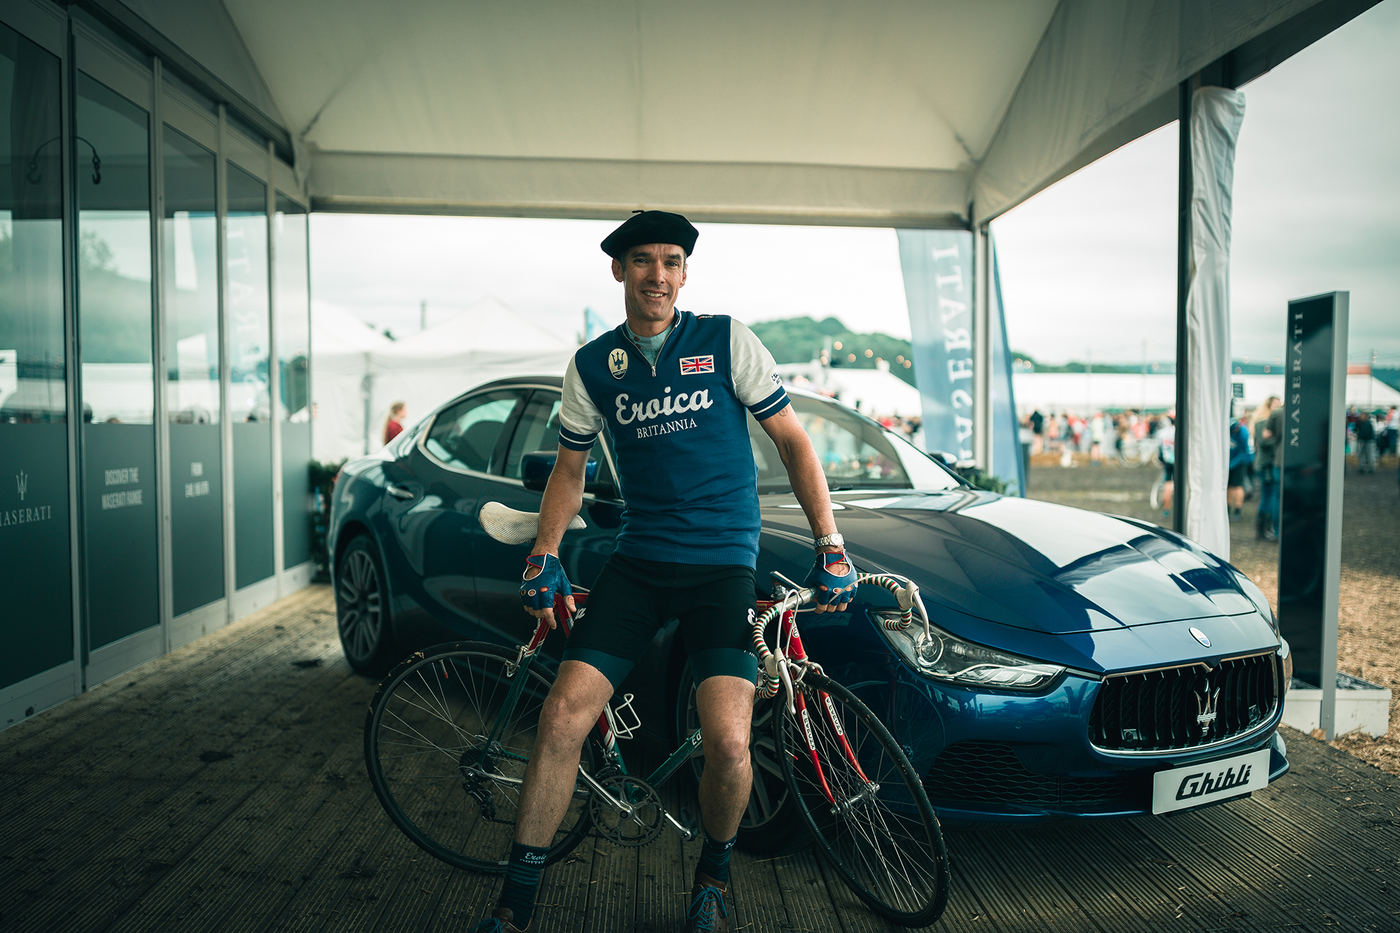 """I'm a big hat man."" David Millar at Eroica Britannia 2016"